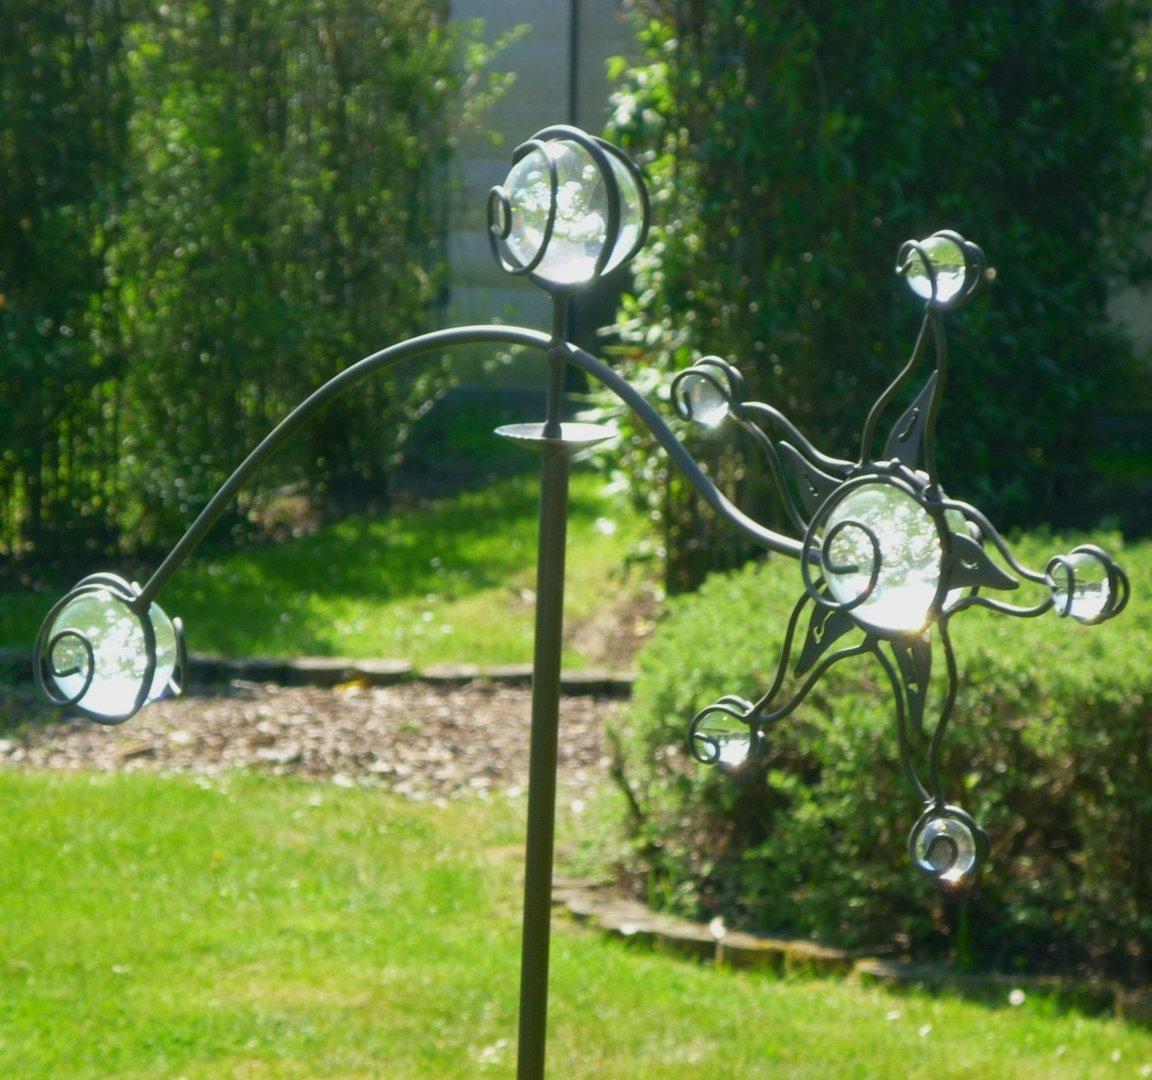 windspiel wippe gartenstecker sonne garten m 8 glaskugeln. Black Bedroom Furniture Sets. Home Design Ideas